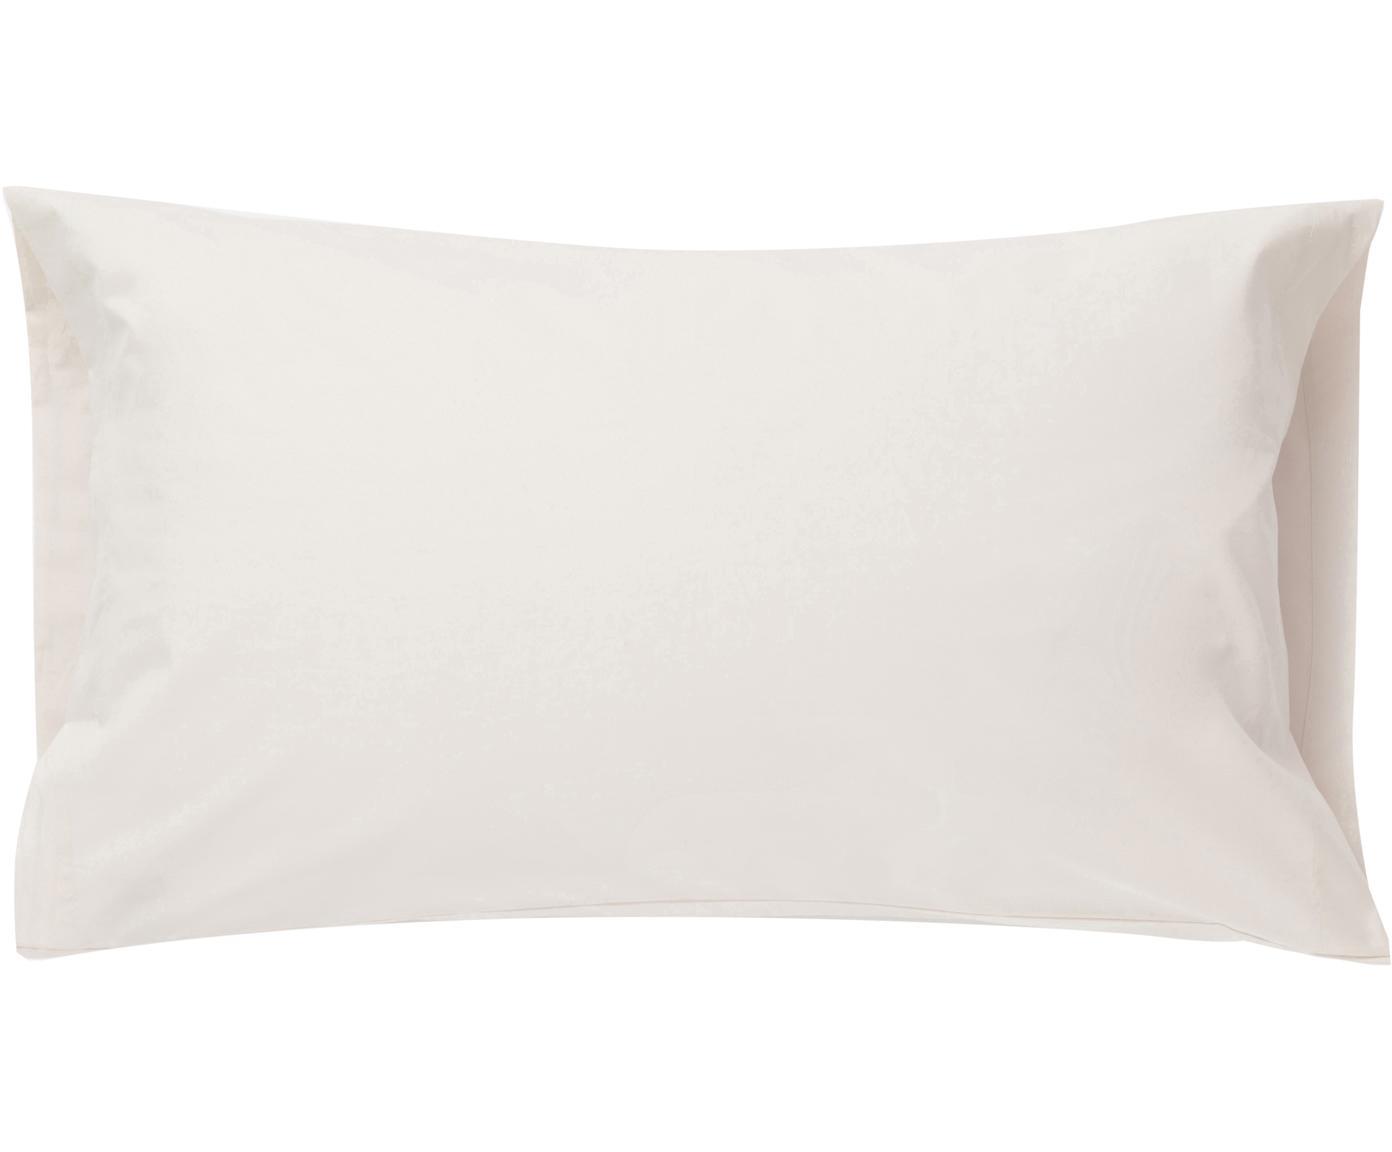 Funda de almohada Plain Dye, Algodón, Crema, An 50 x L 110 cm